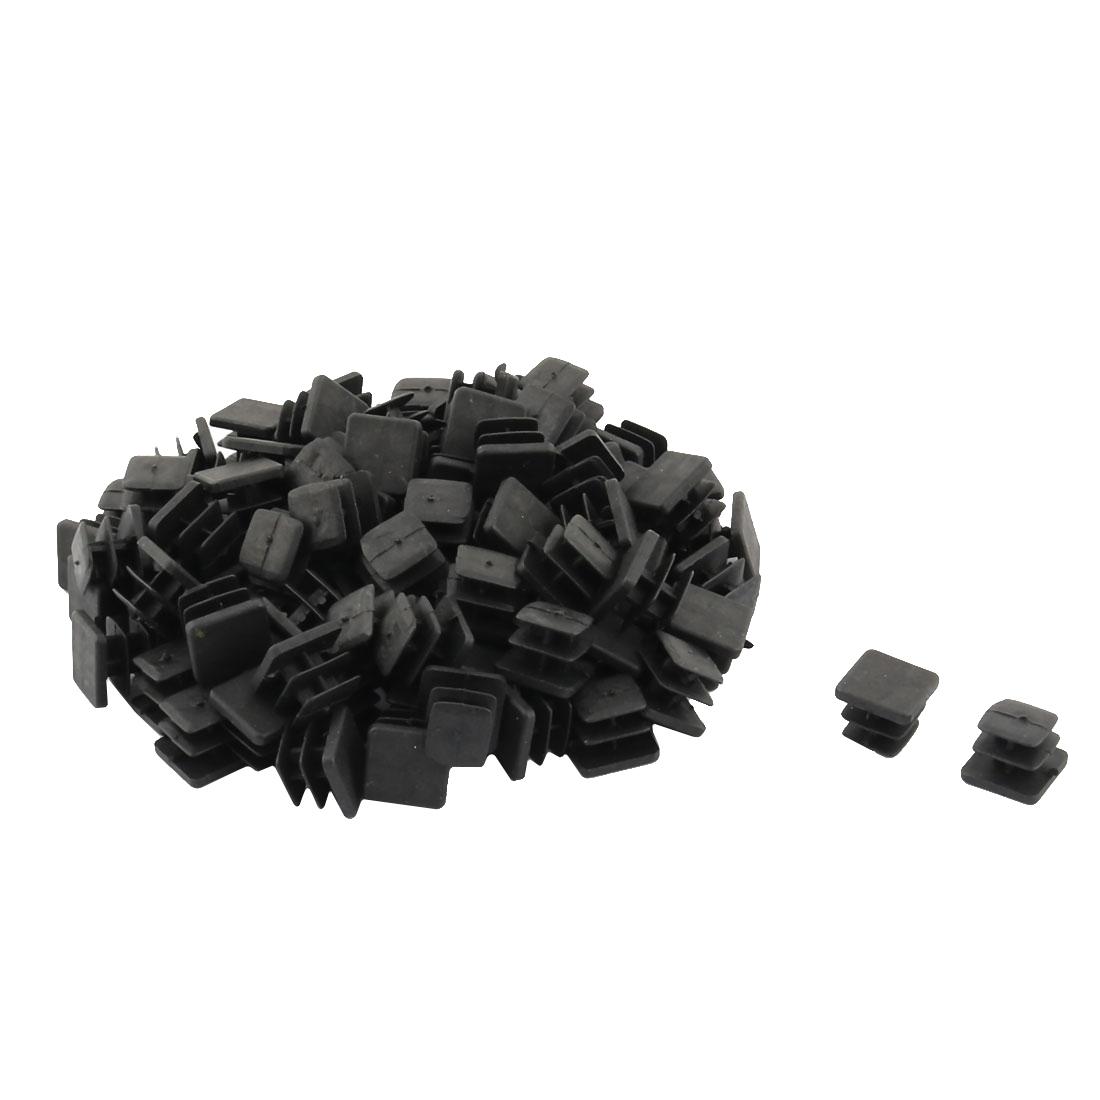 Plastic Square Design Tube Insert End Blanking Cover Cap Black 13 x 13mm 100pcs